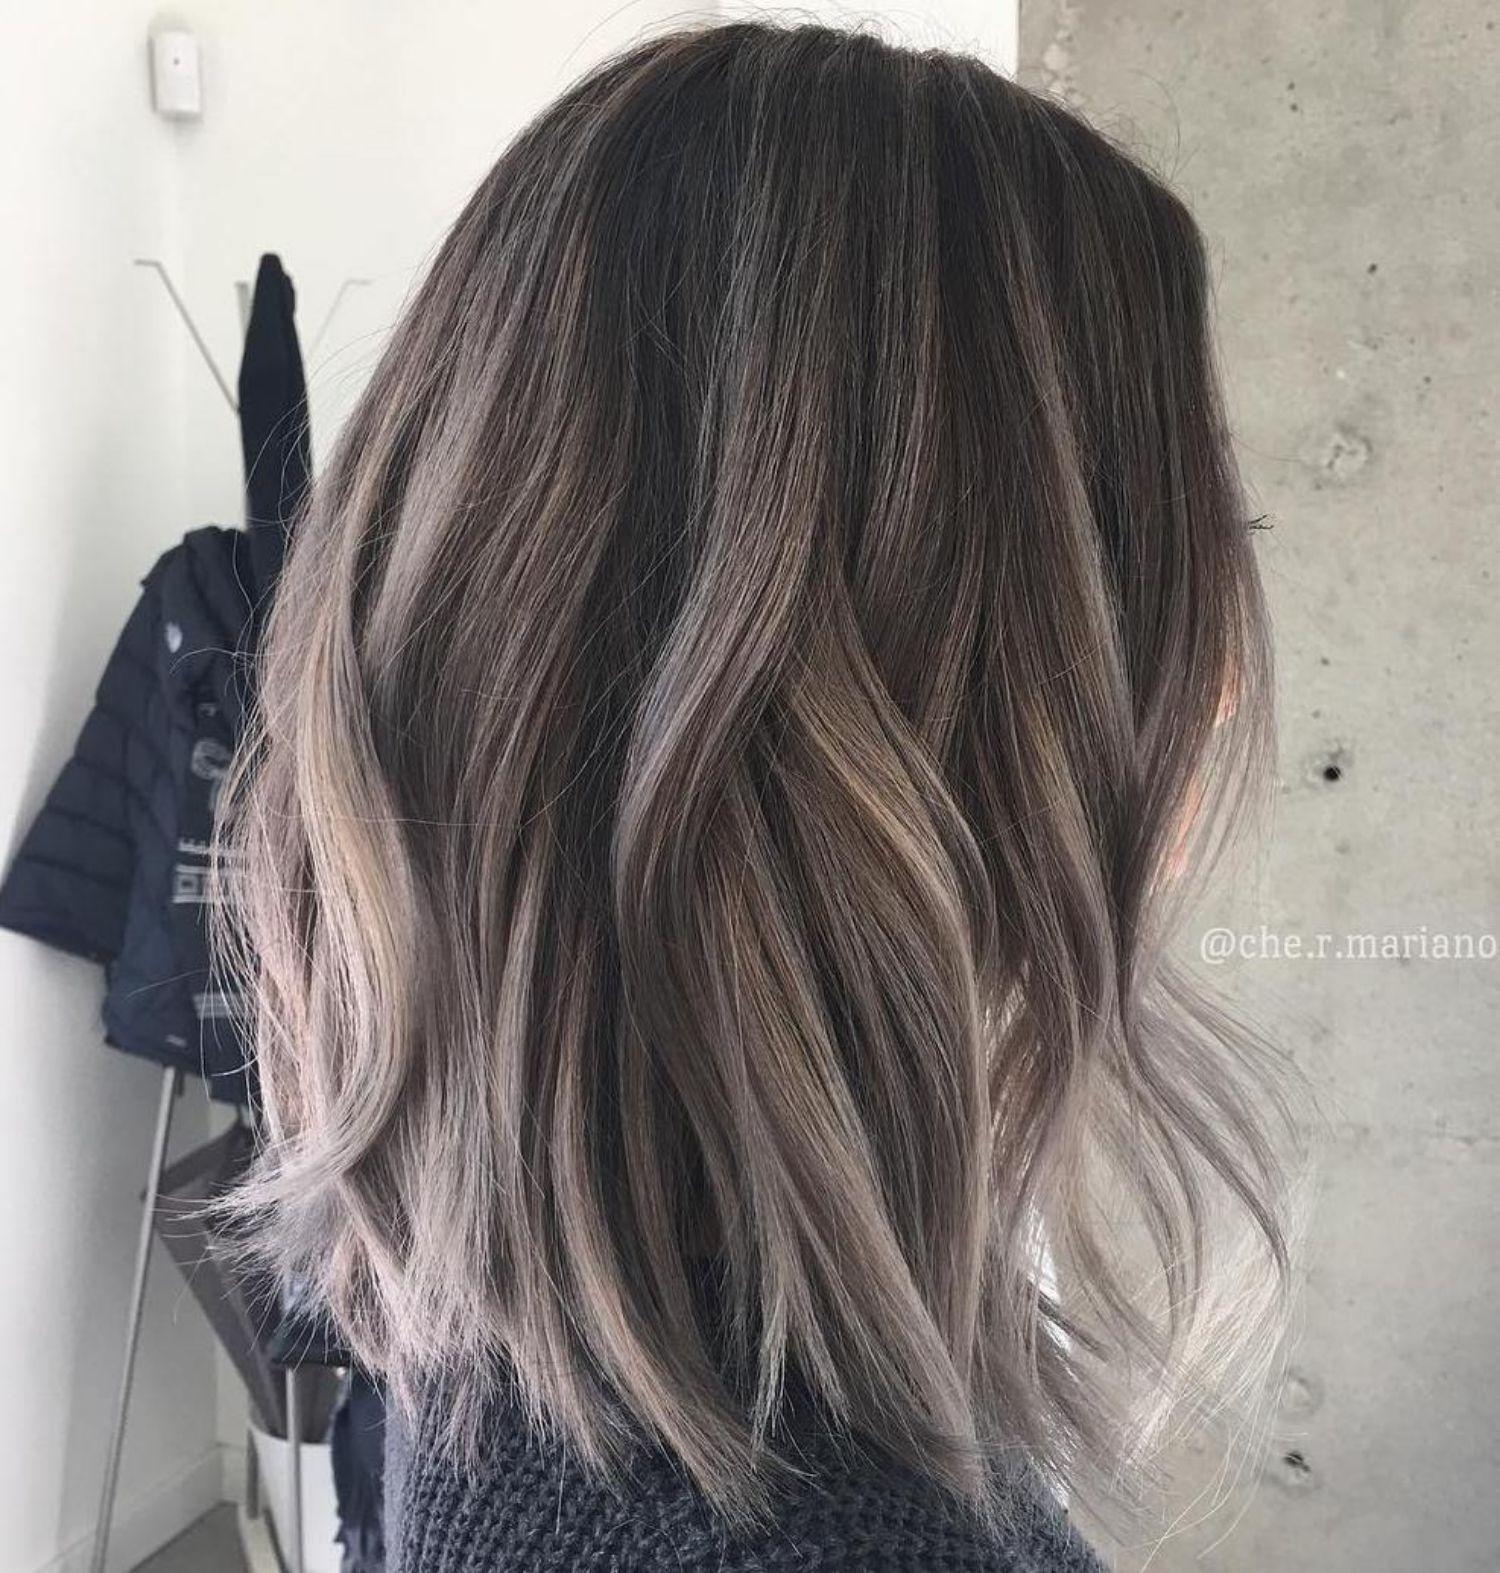 60 Shades Of Grey Silver And White Highlights For Eternal Youth Medium Hair Color Medium Length Hair Styles Hair Colour Design